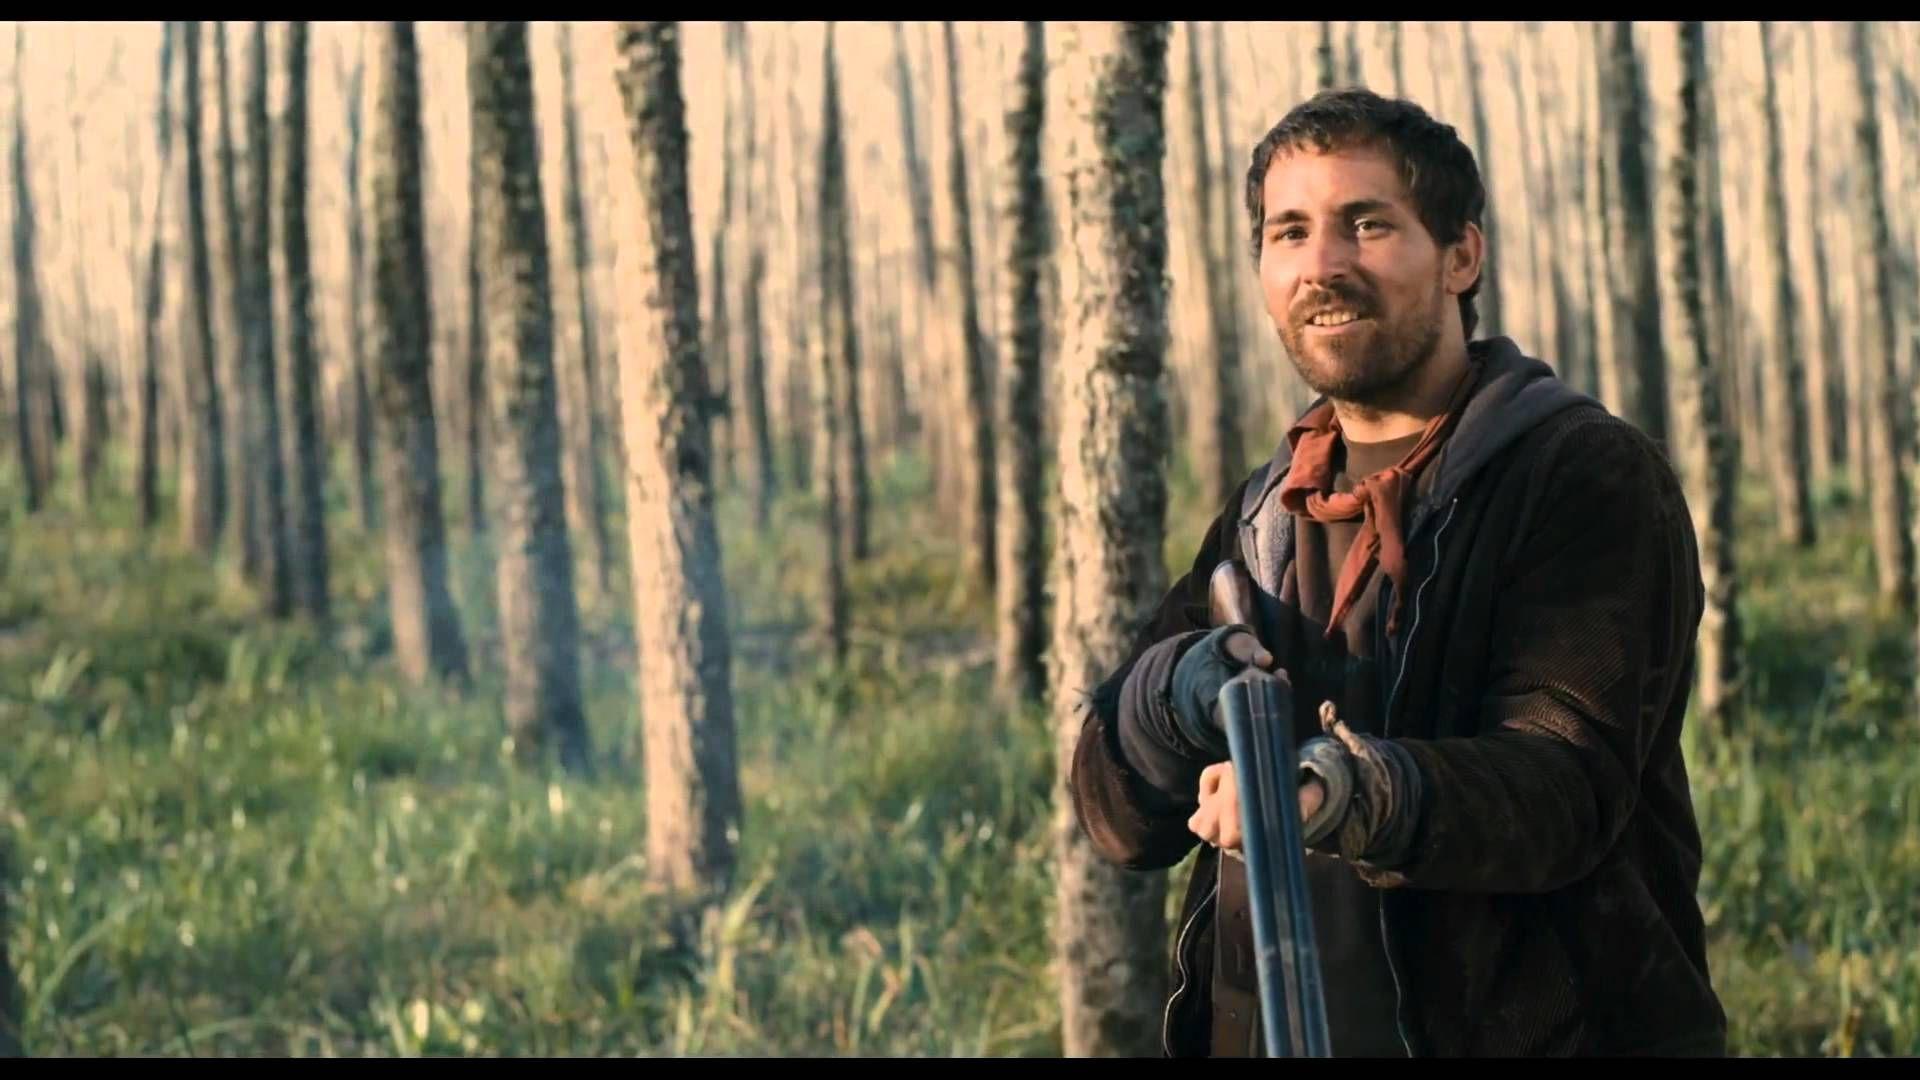 Todo Tenemos Un Plan - Everybody Has a Plan, 2012. Awesome movie, plus Viggo Mortensen espeakin in eSpanish :P